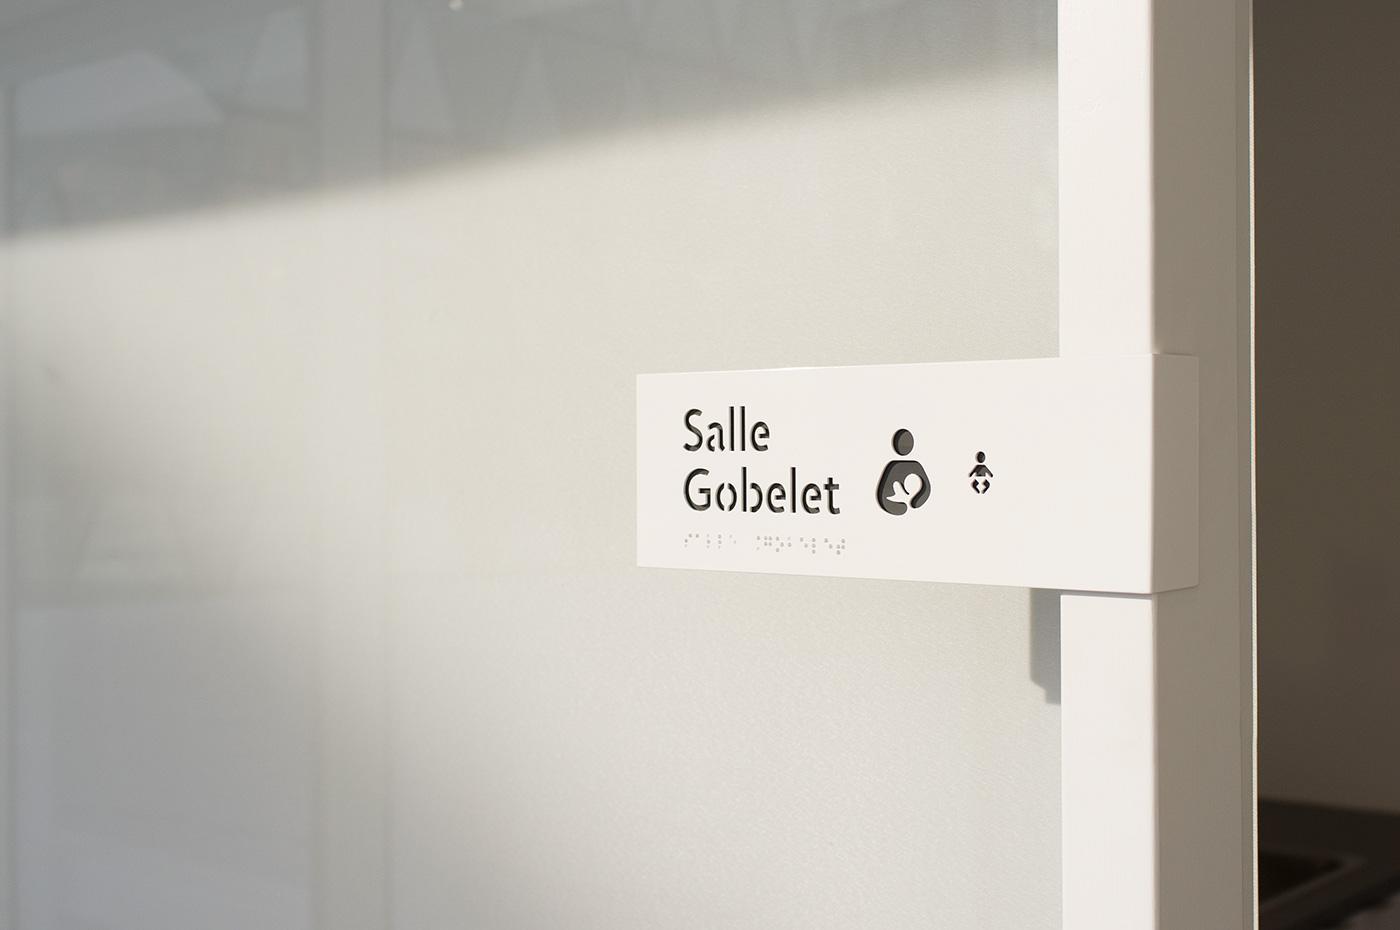 Marc-Favreau图书馆导视,EGD, 环境图形设计, 图书馆标识,图书馆指示系统